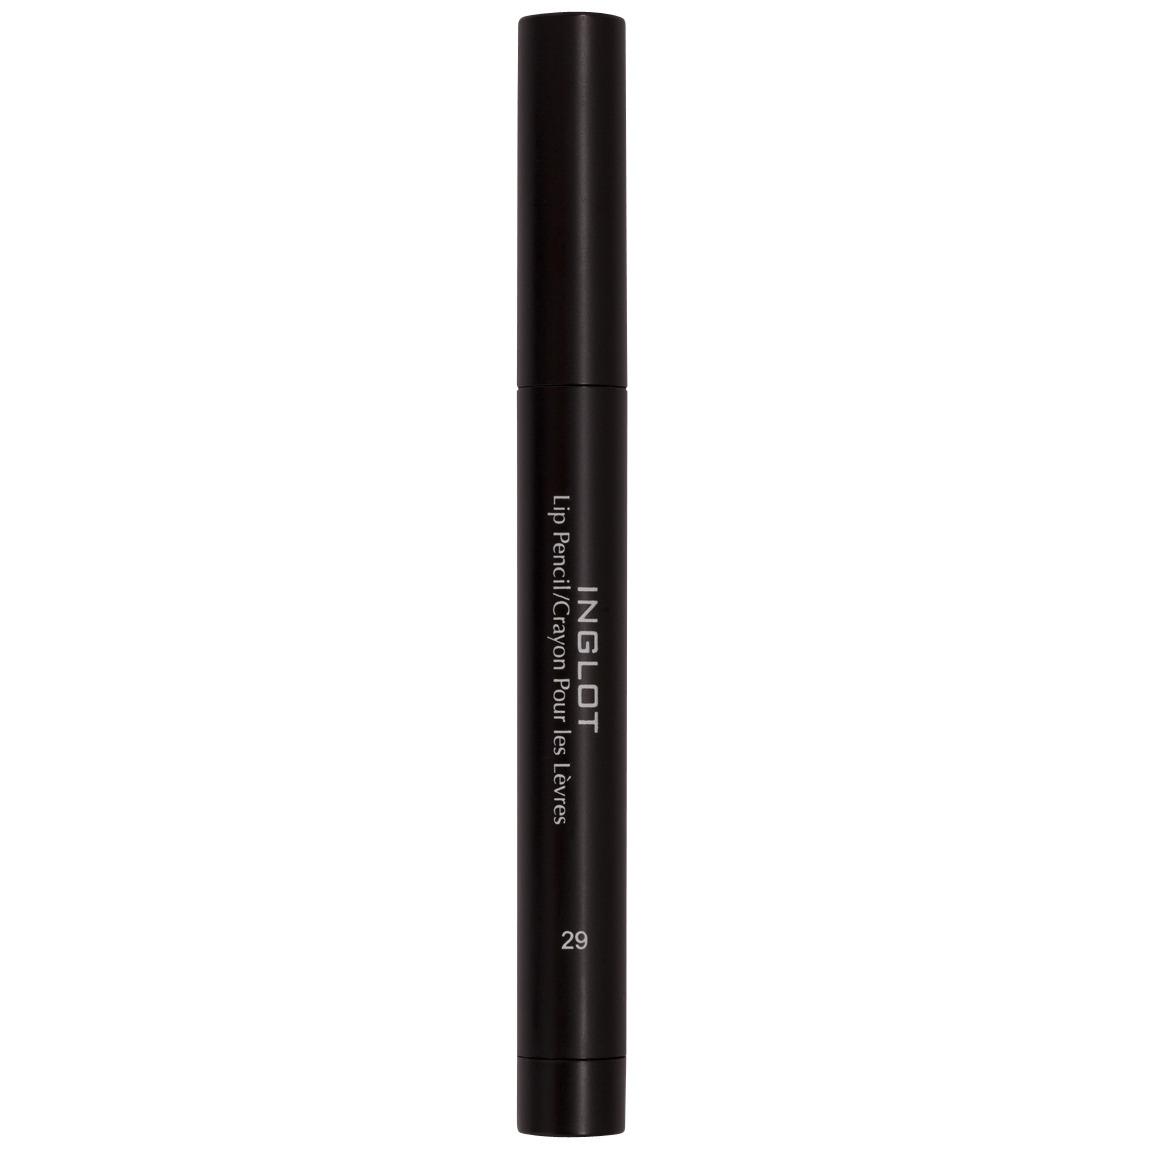 Inglot Cosmetics AMC Lip Pencil 29 Matte